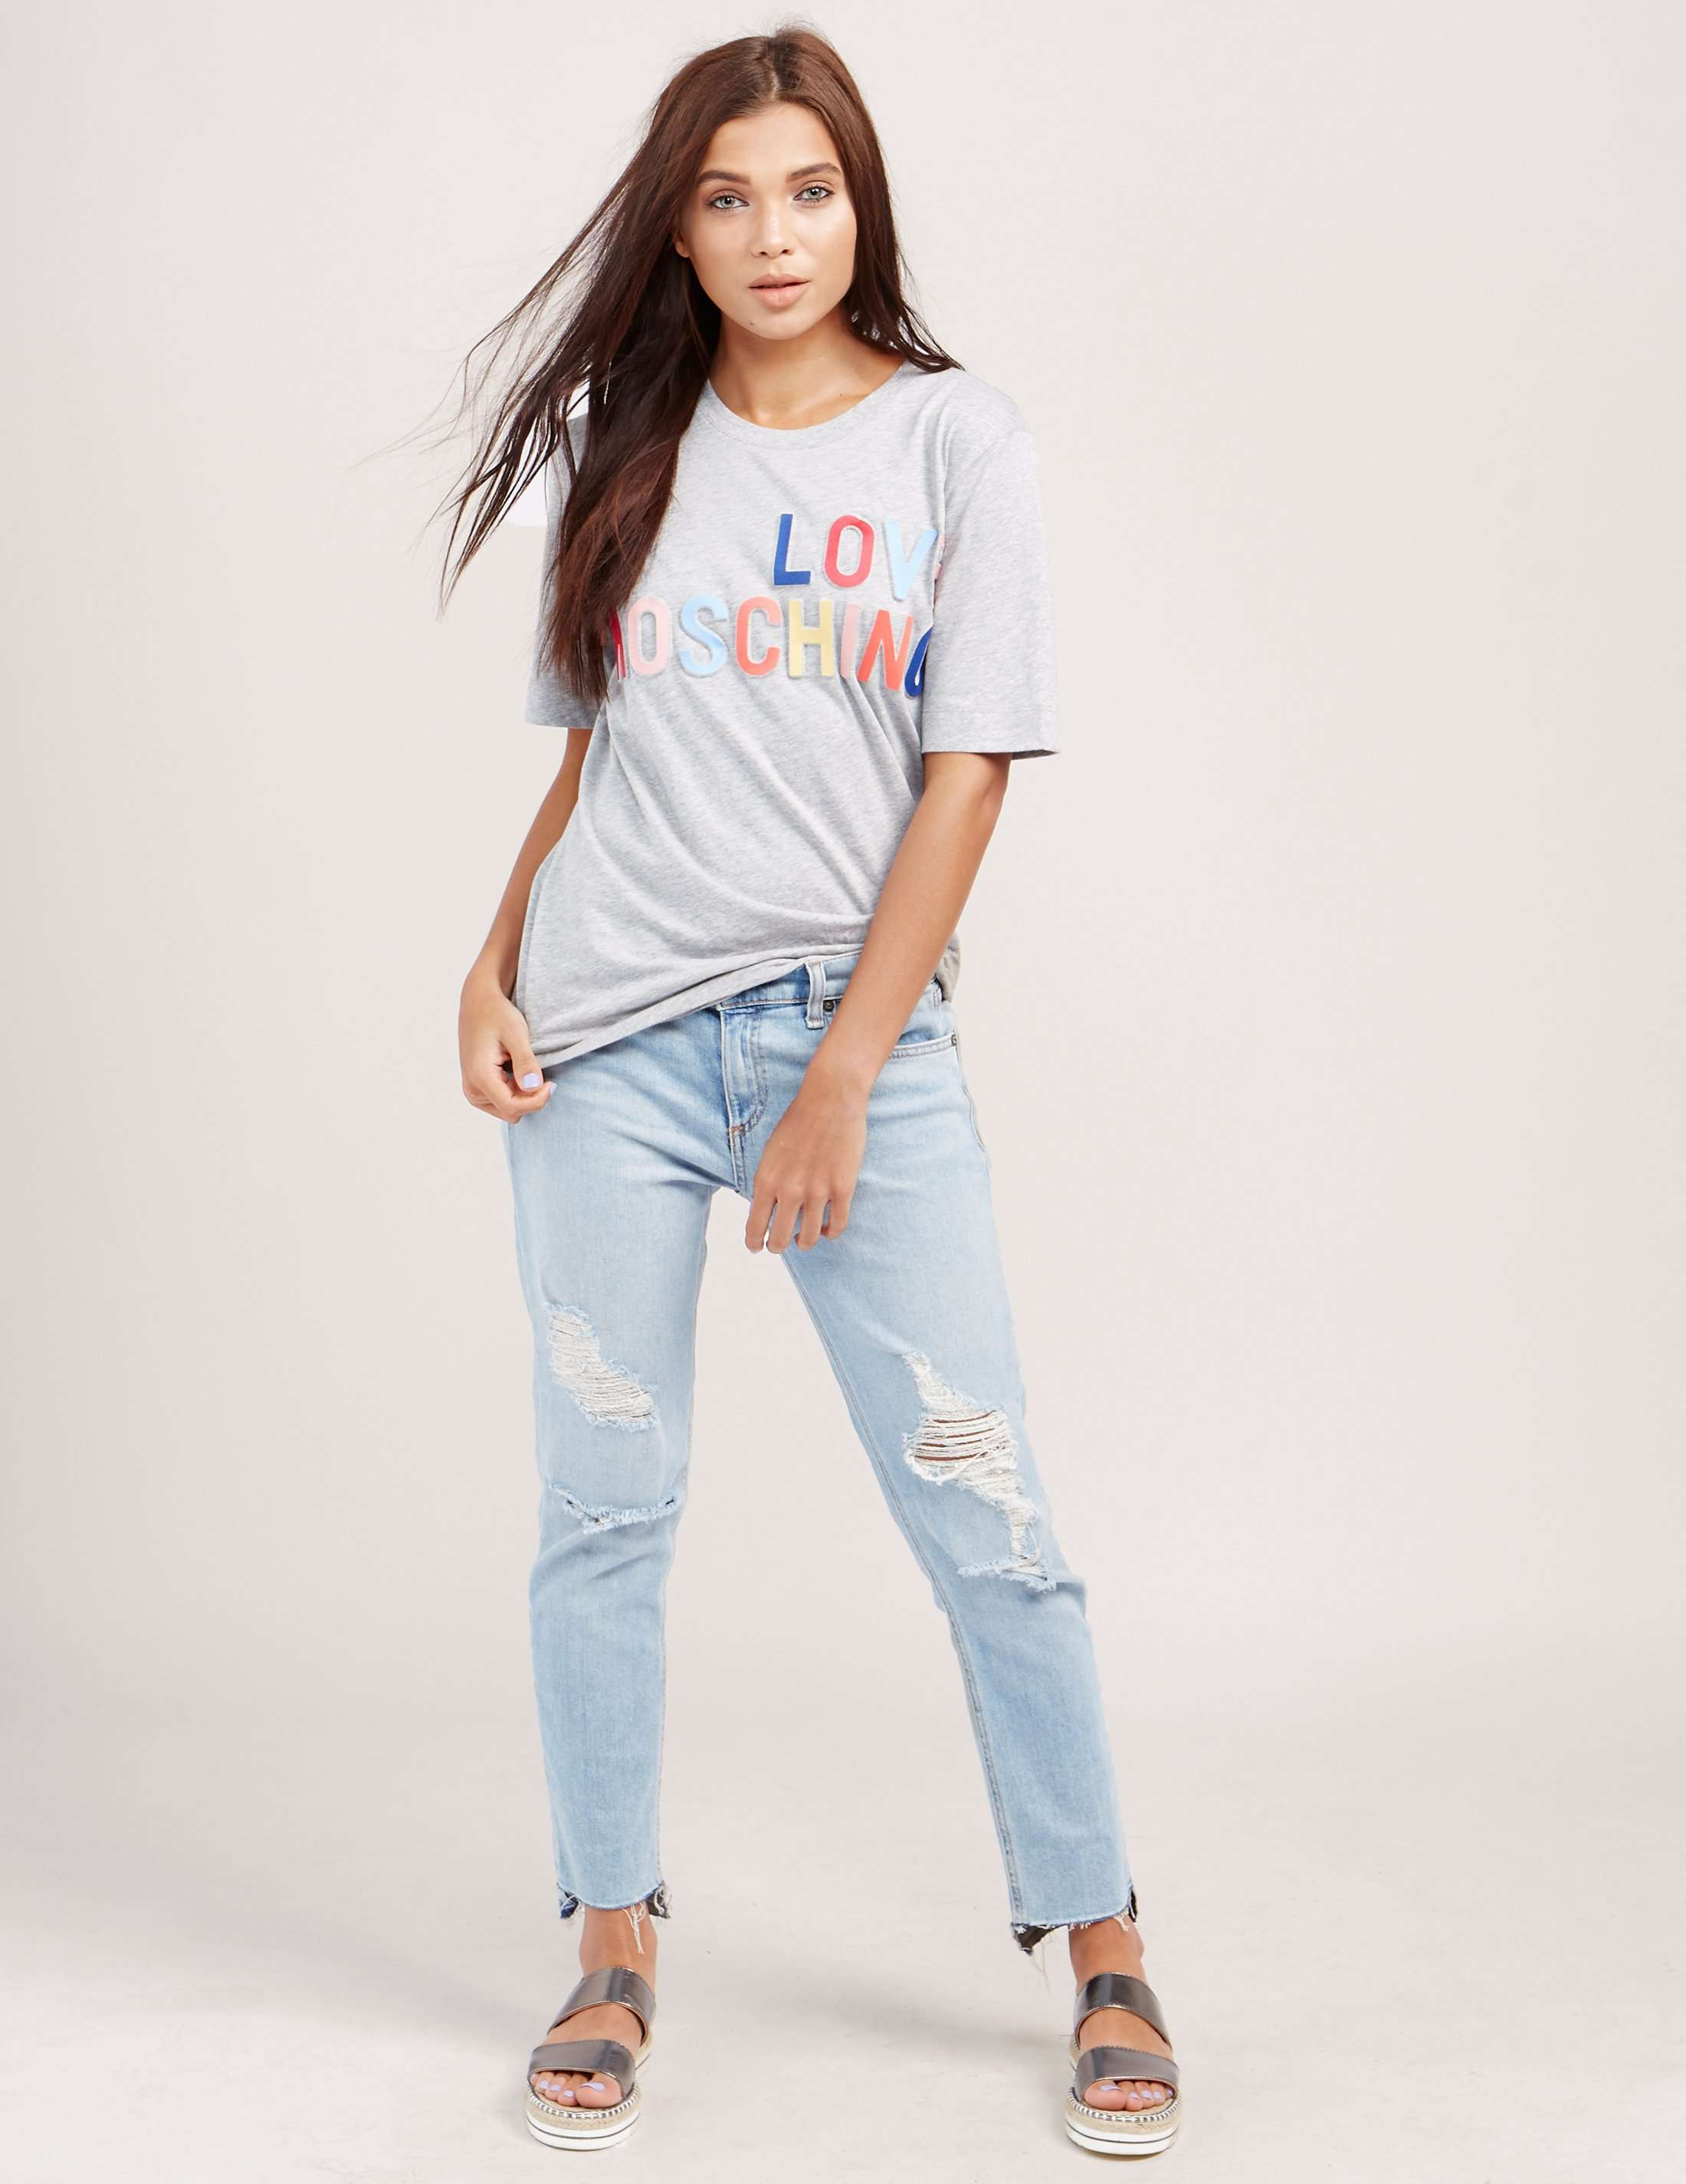 Love Moschino Branded Short Sleeve T-Shirt